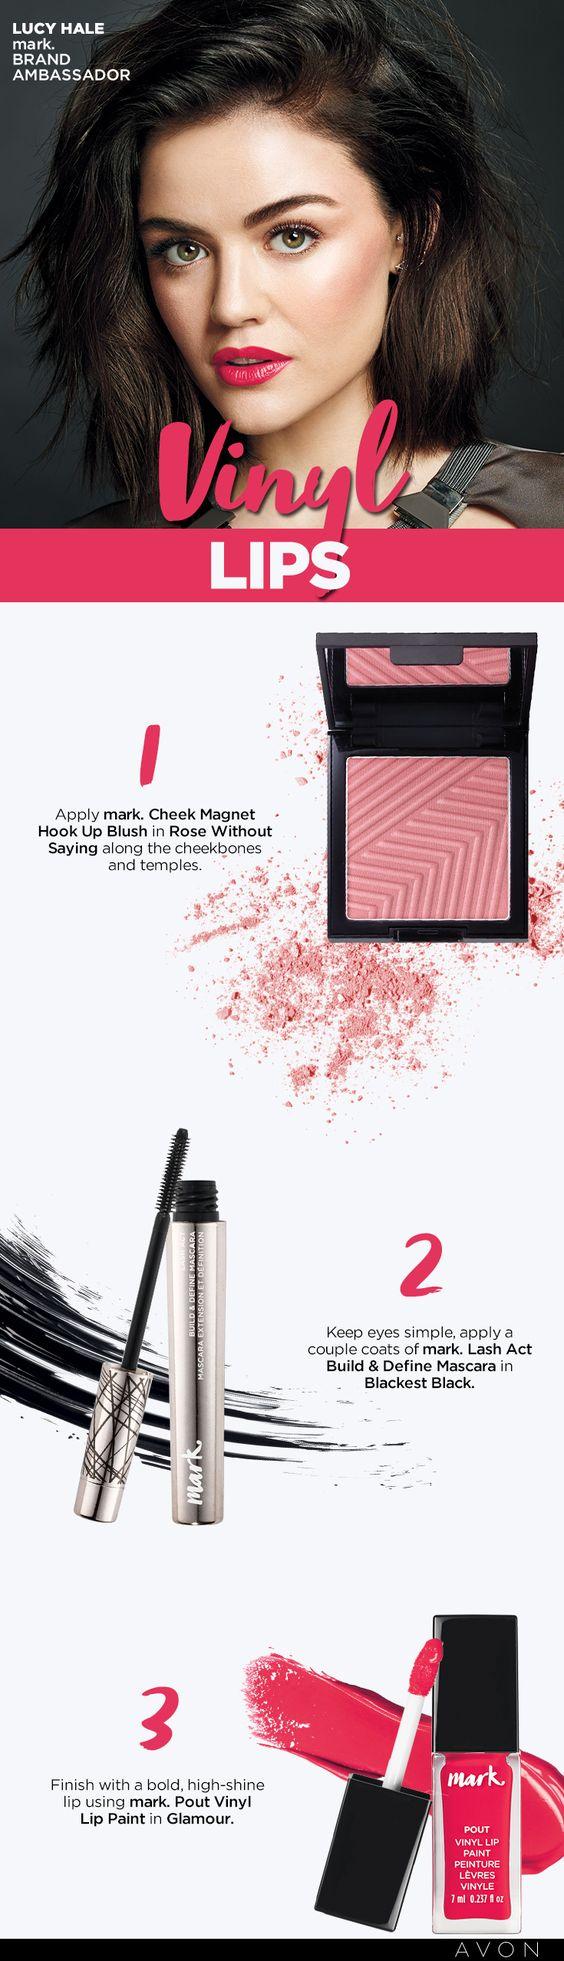 Pin by Avon Canadian Rep on Makeup Vinyl lips, Mark makeup